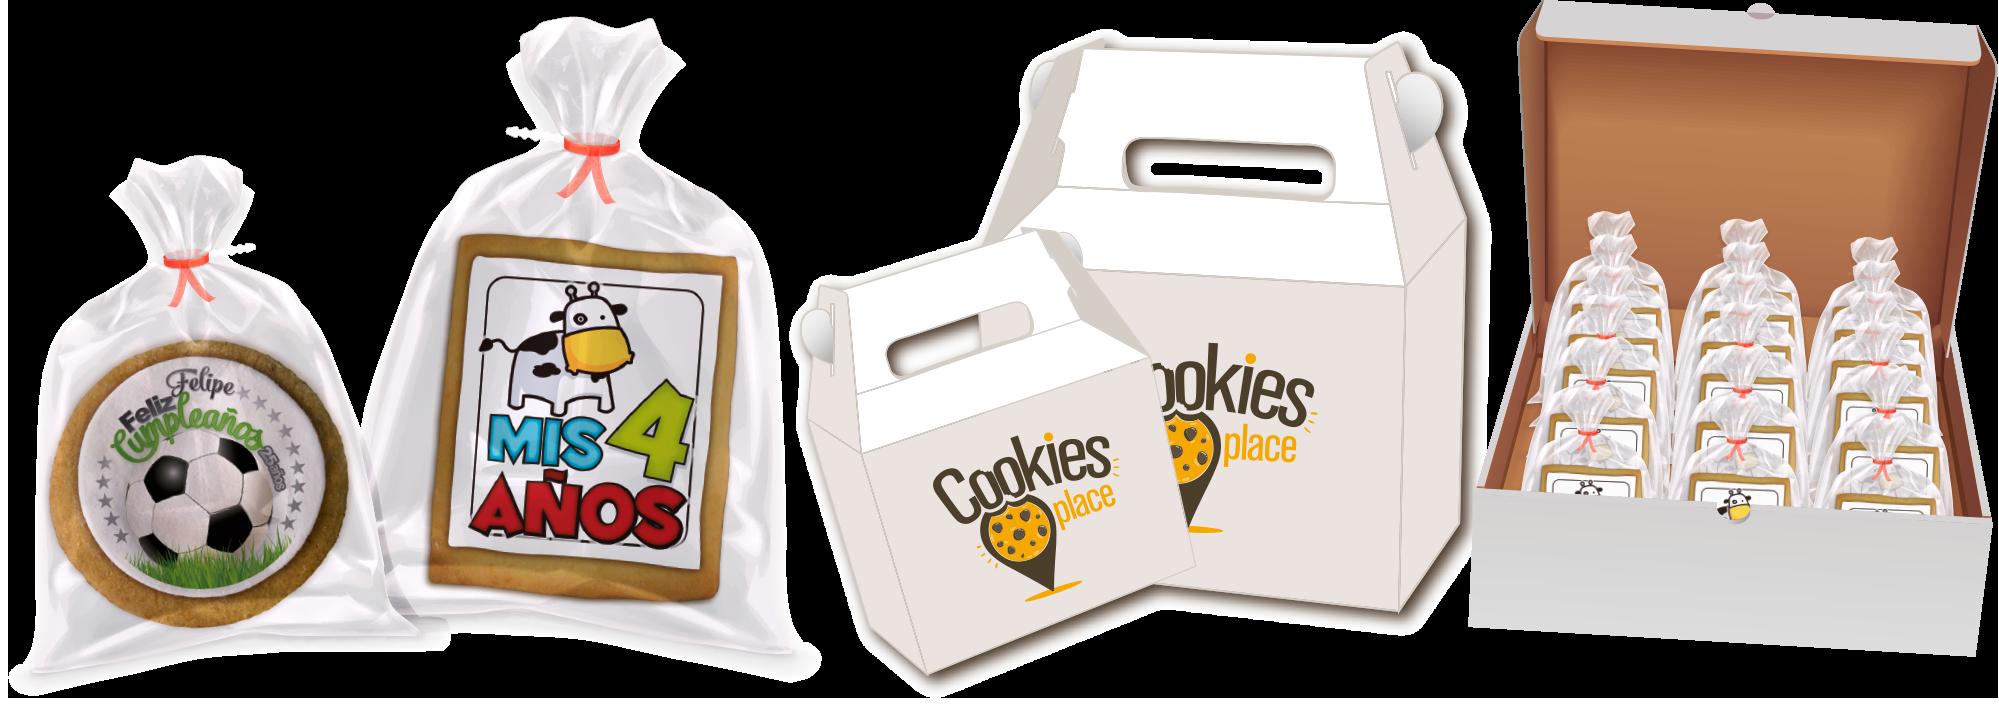 cookies-place-cookies-diseno-empaques